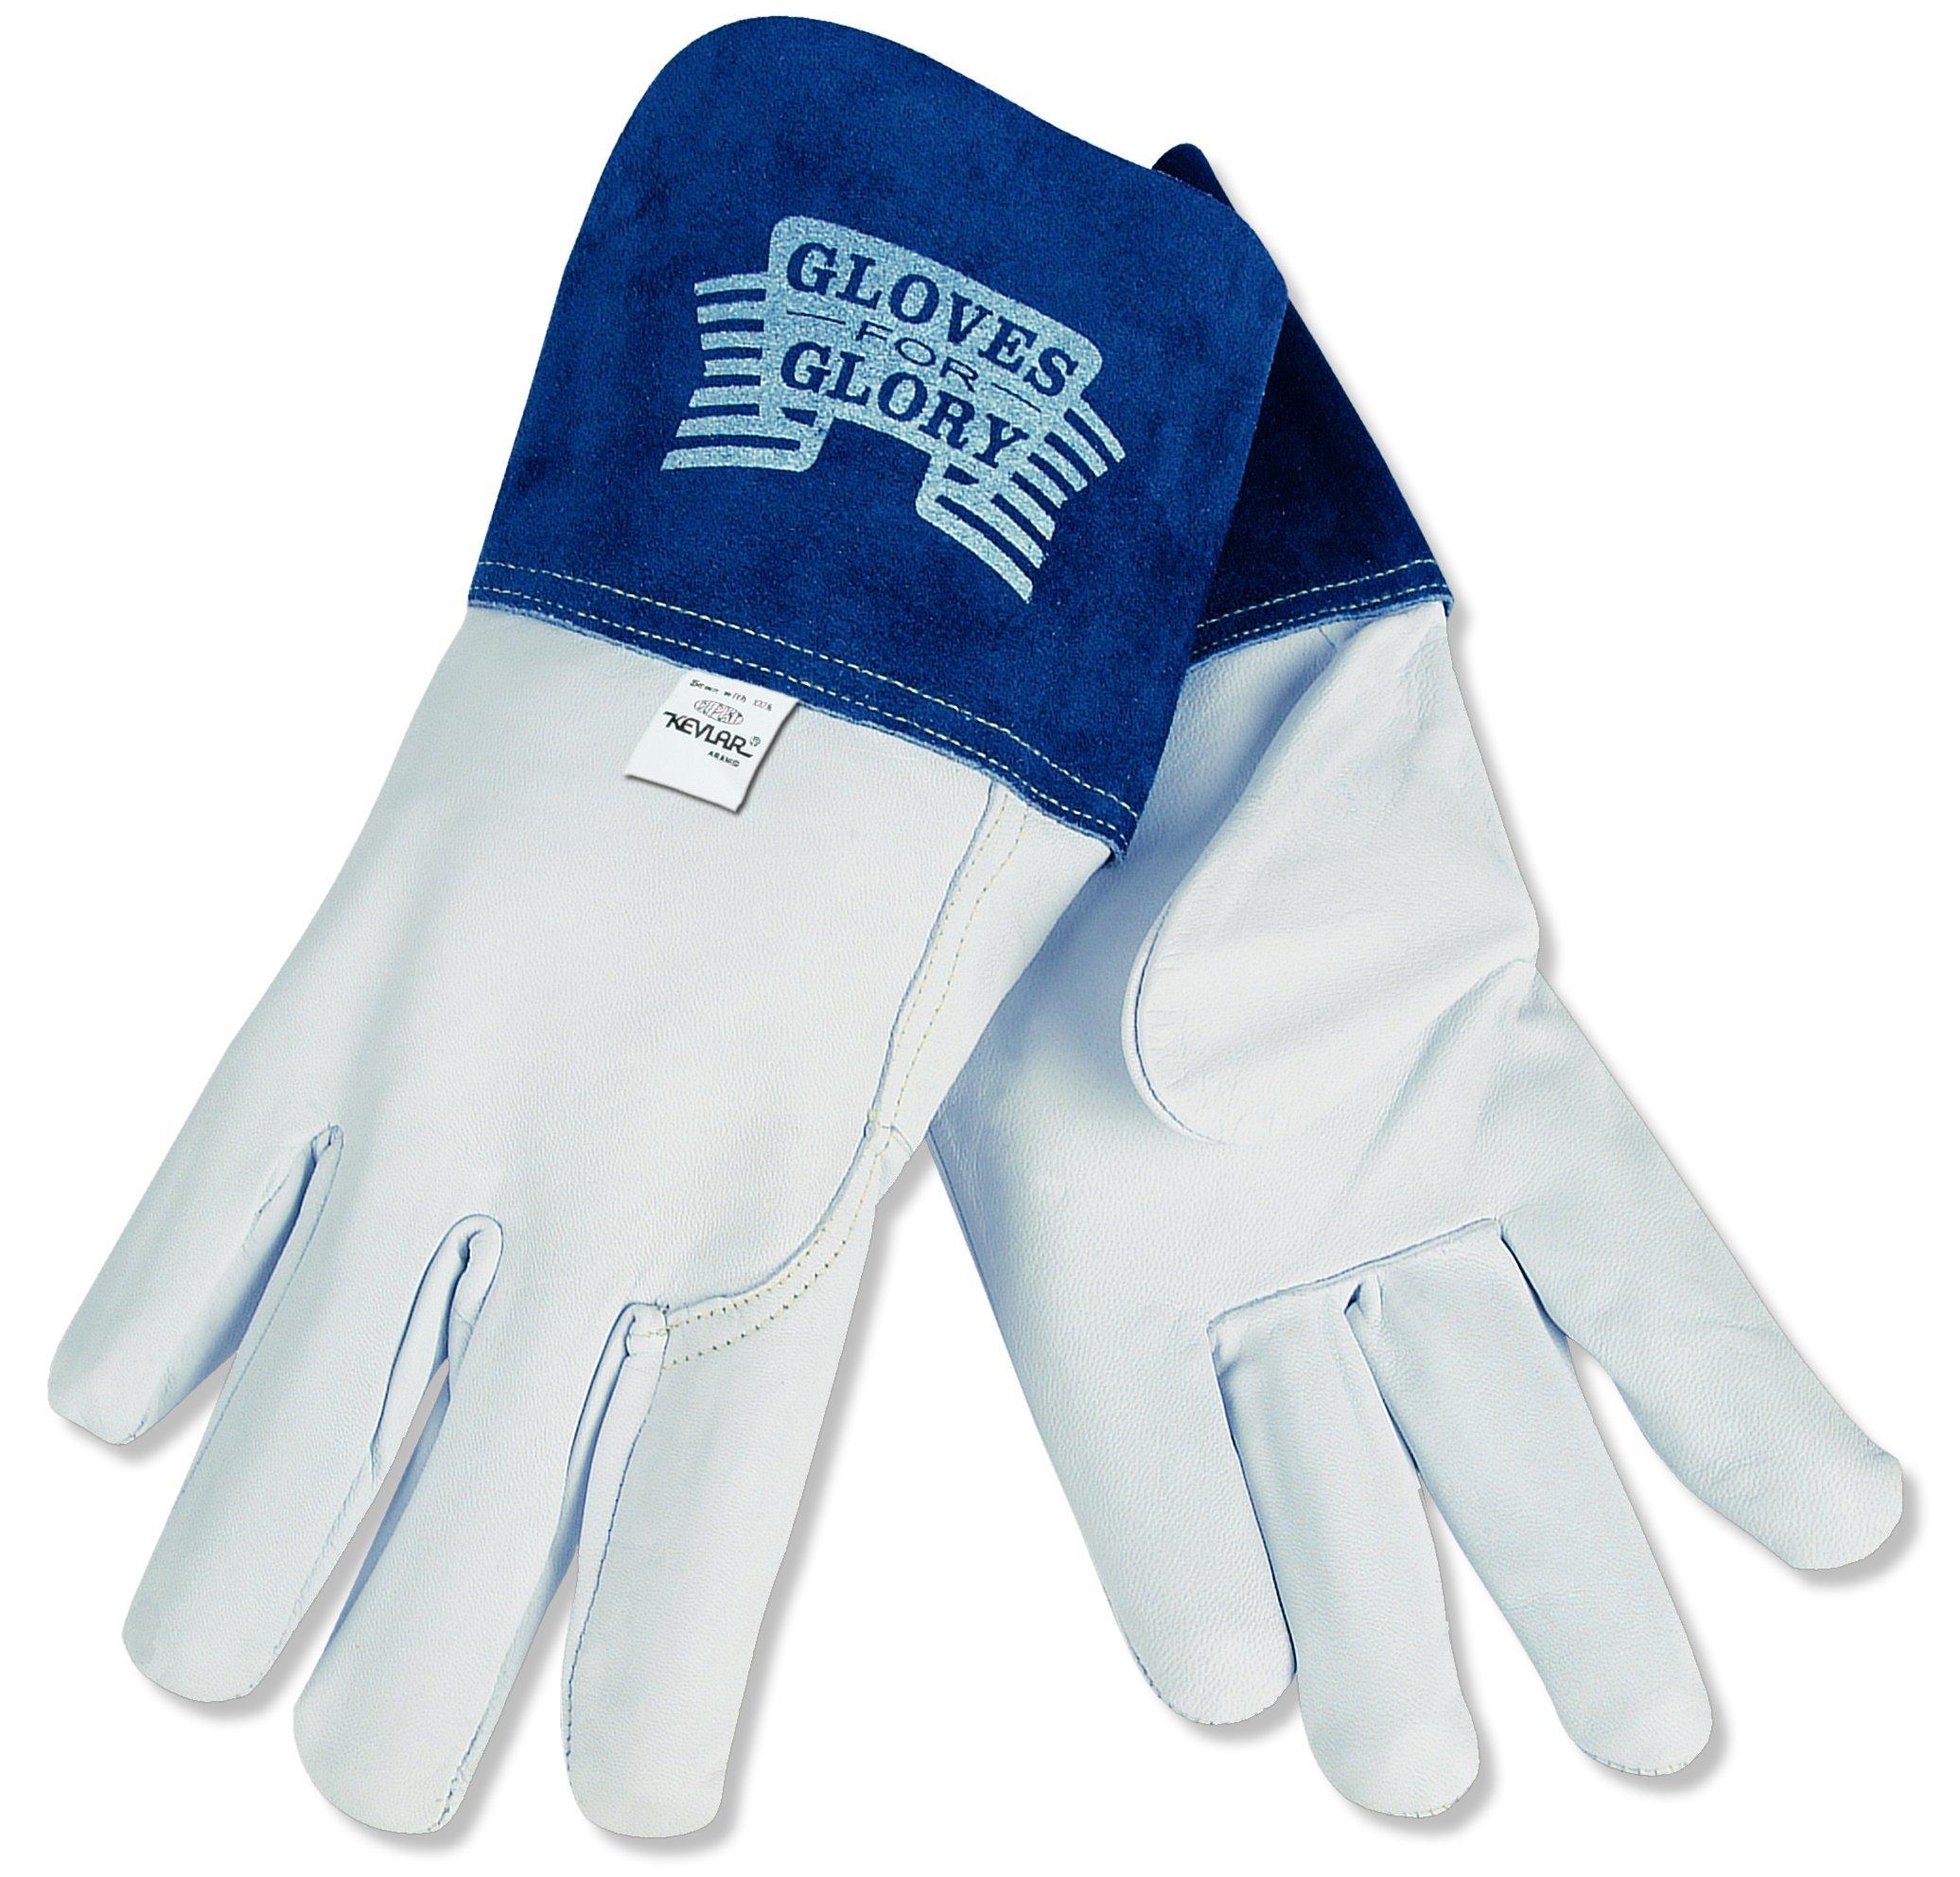 MCR Safety 4850L Gloves for Glory Premium Grain Goatskin MIG/TIG Welder Men's Gloves with Split Cow Gauntlet Cuff, Natural Pearl, Large, 1-Pair